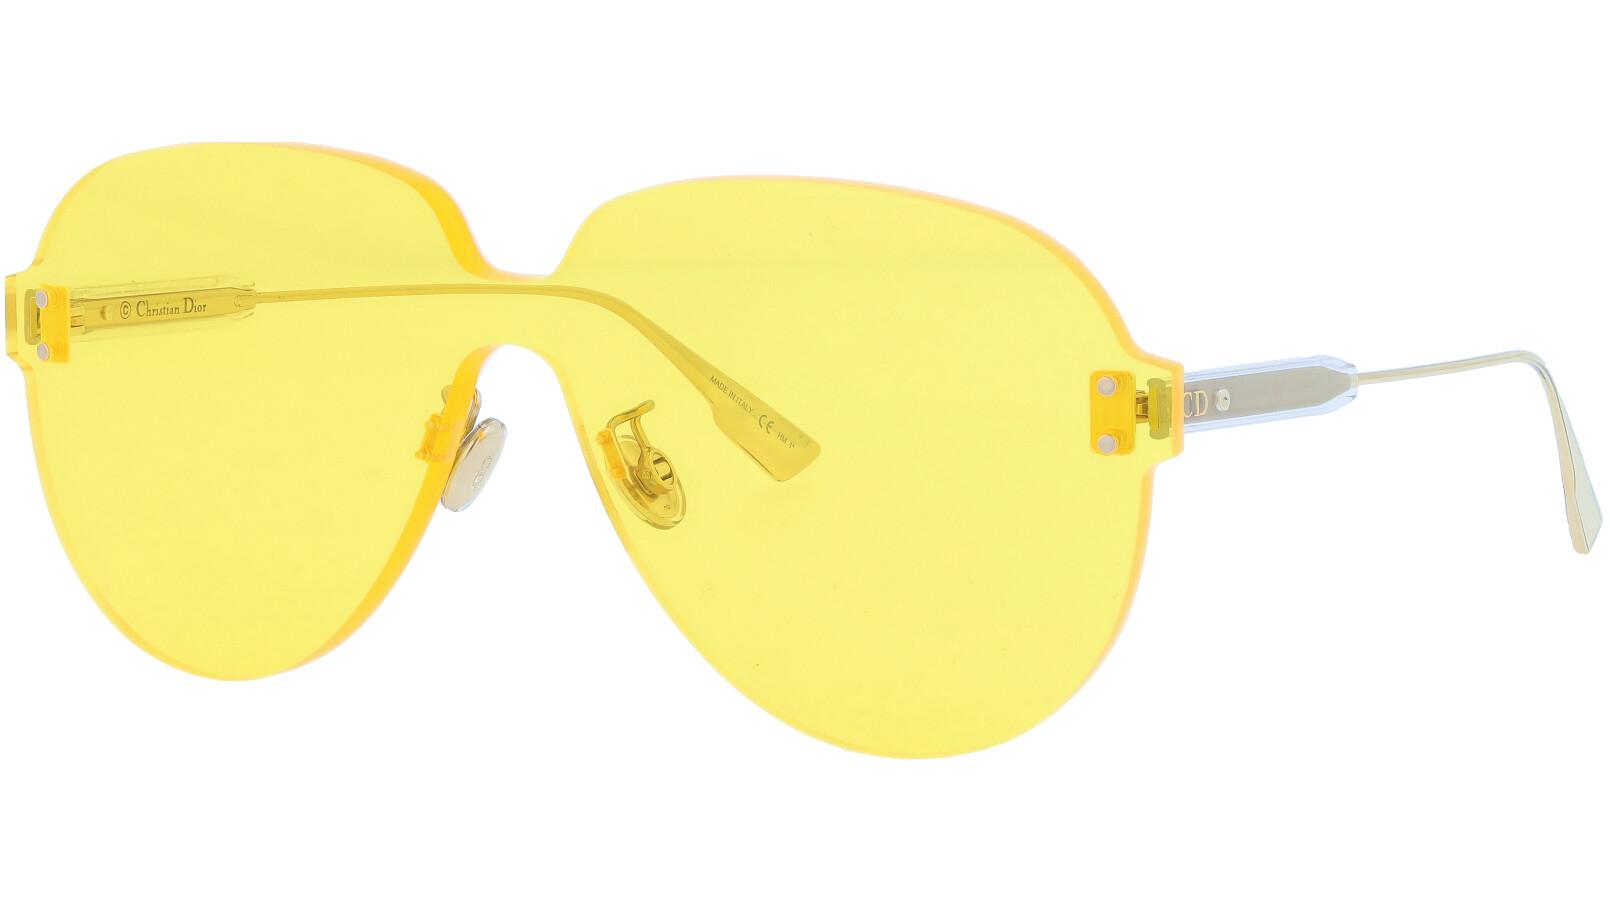 DIOR DIORCOLORQUAKE3 40GHO 99 YELLOW Sunglasses